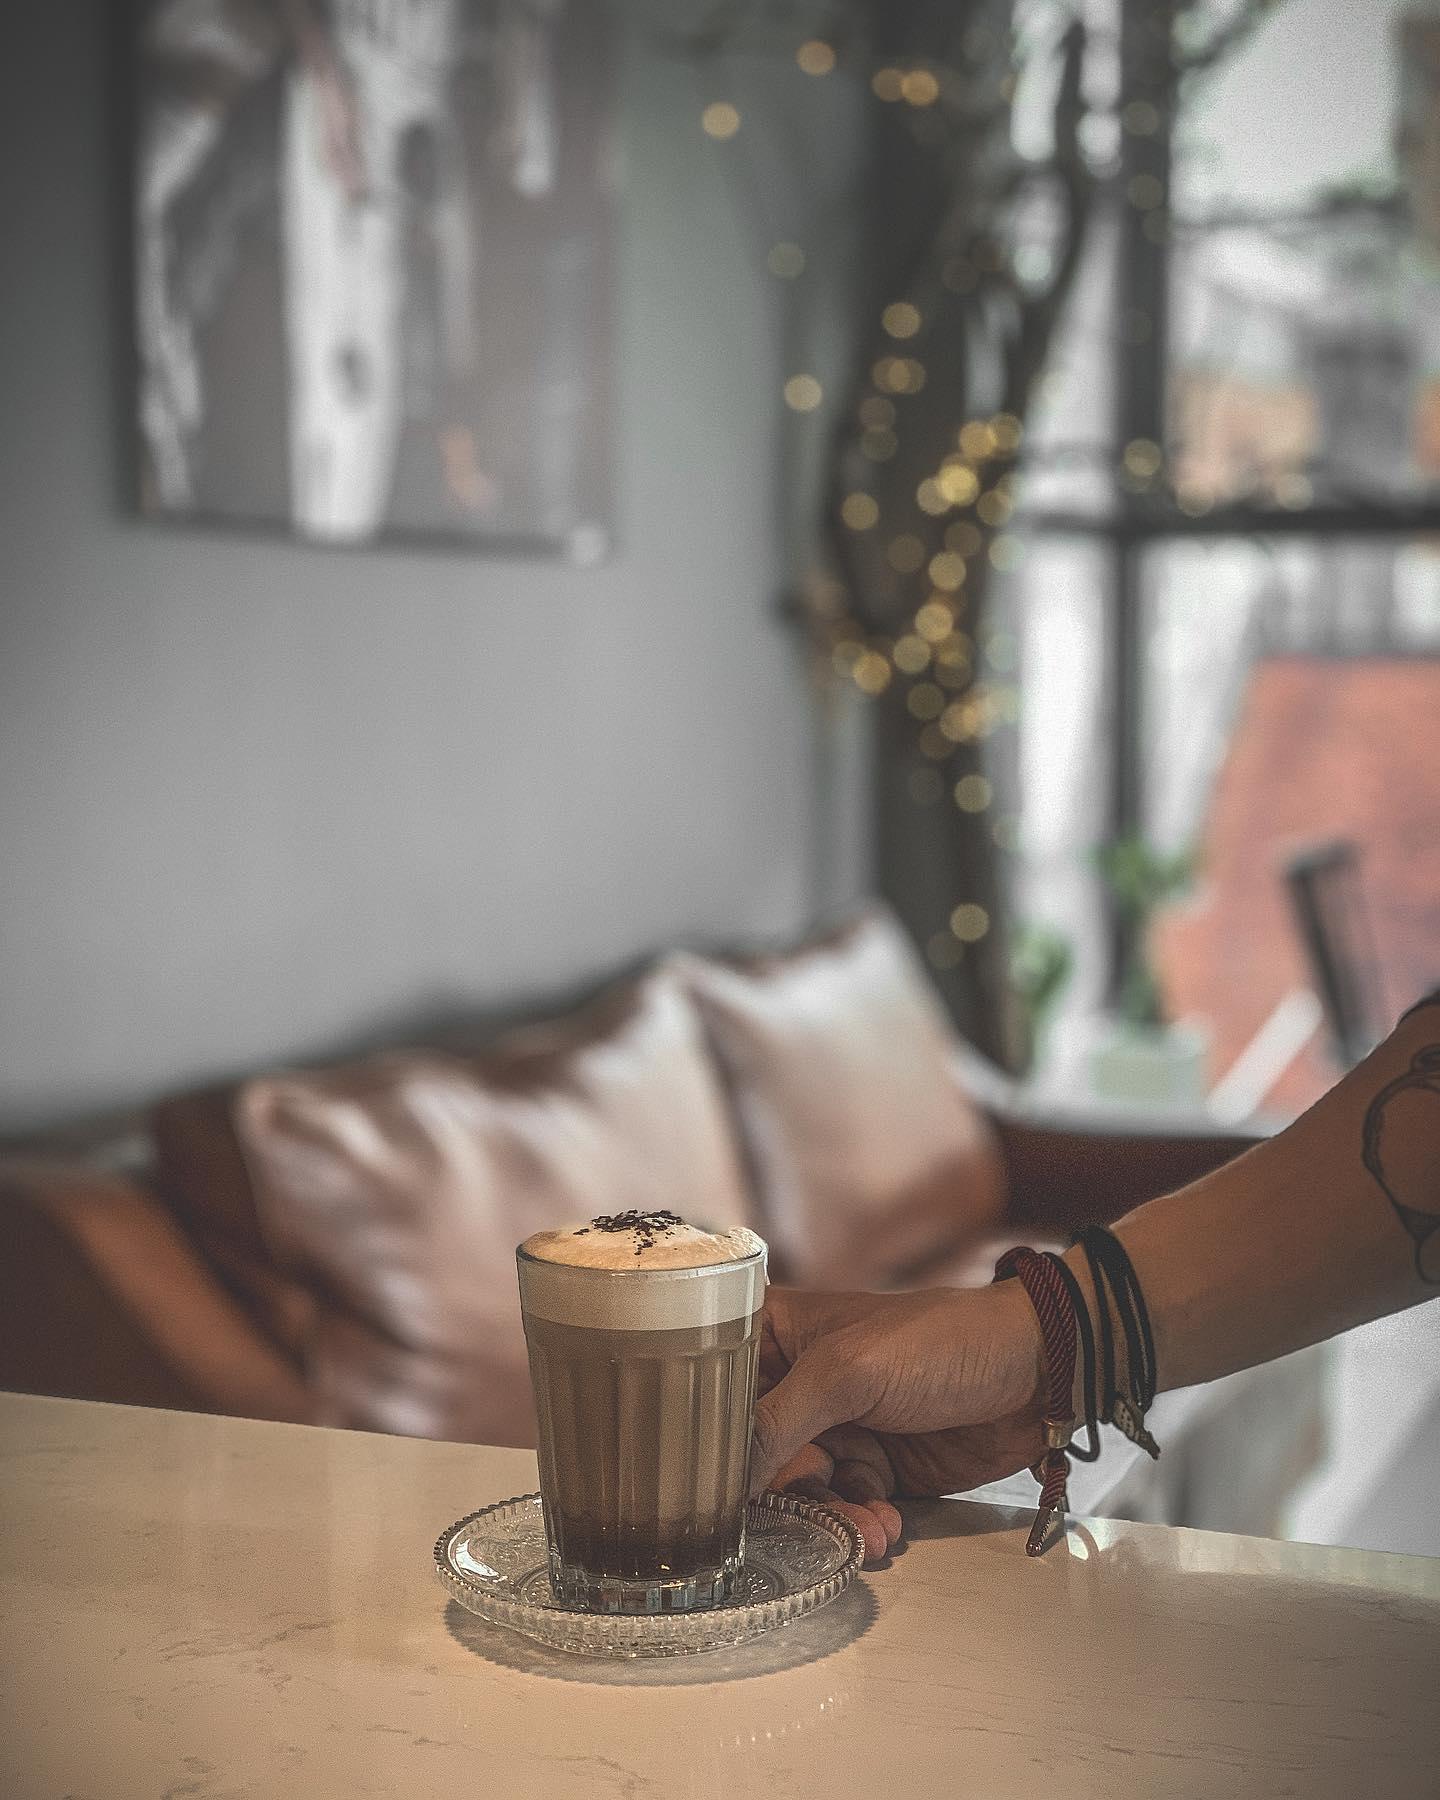 sai-gon-cafe-dep-tai-sai-gon-infinity-coffee-10